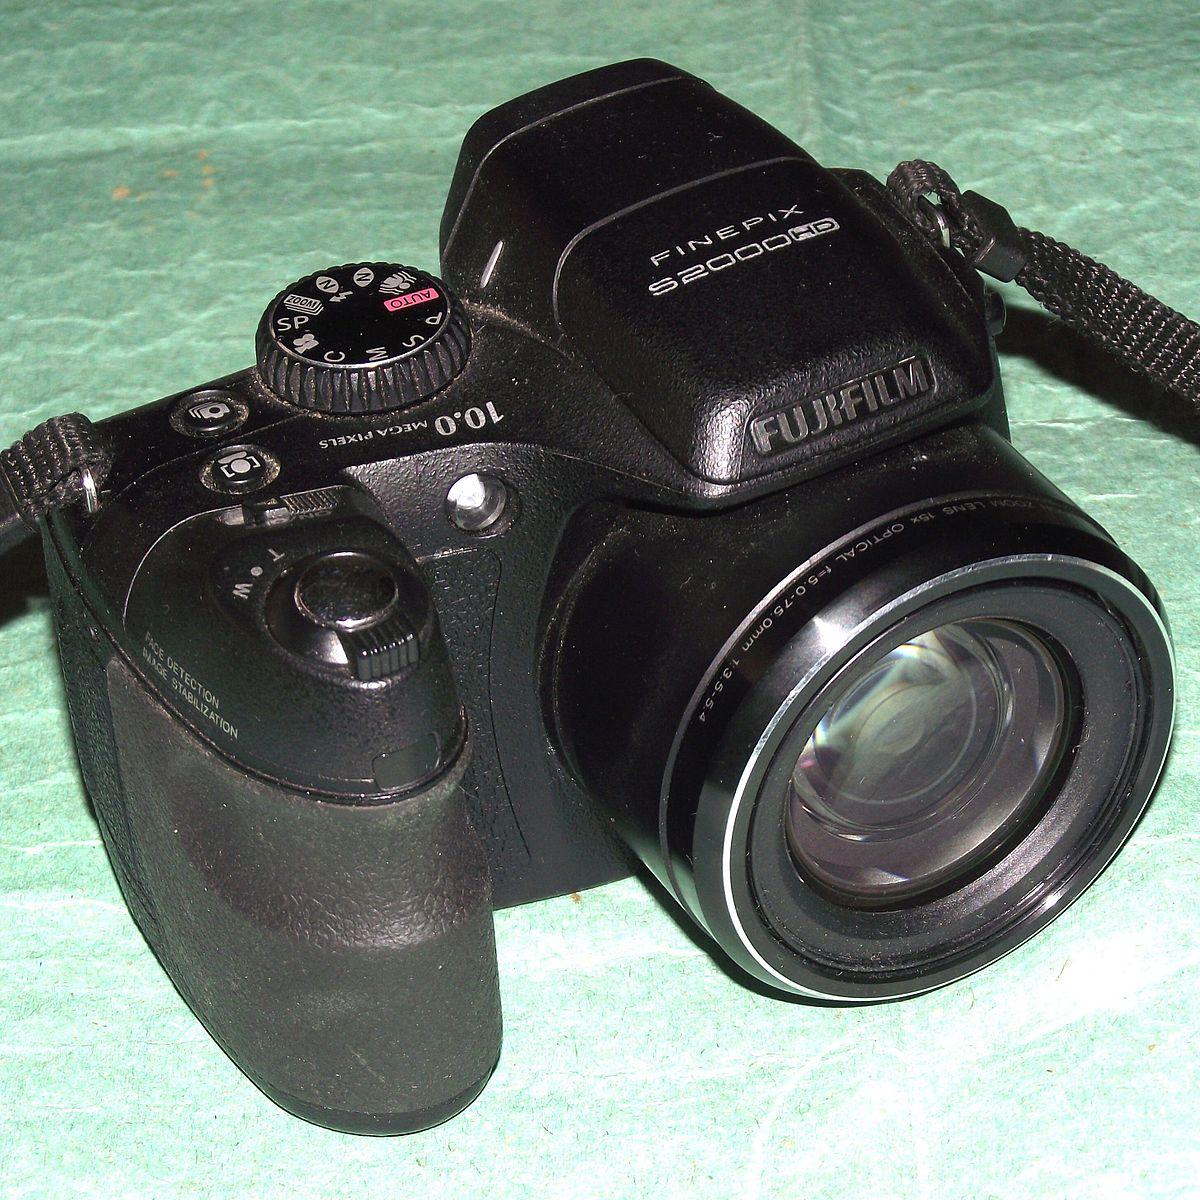 Fujifilm finepix s2000hd wikidata for Appareil photo fujifilm finepix s2000hd